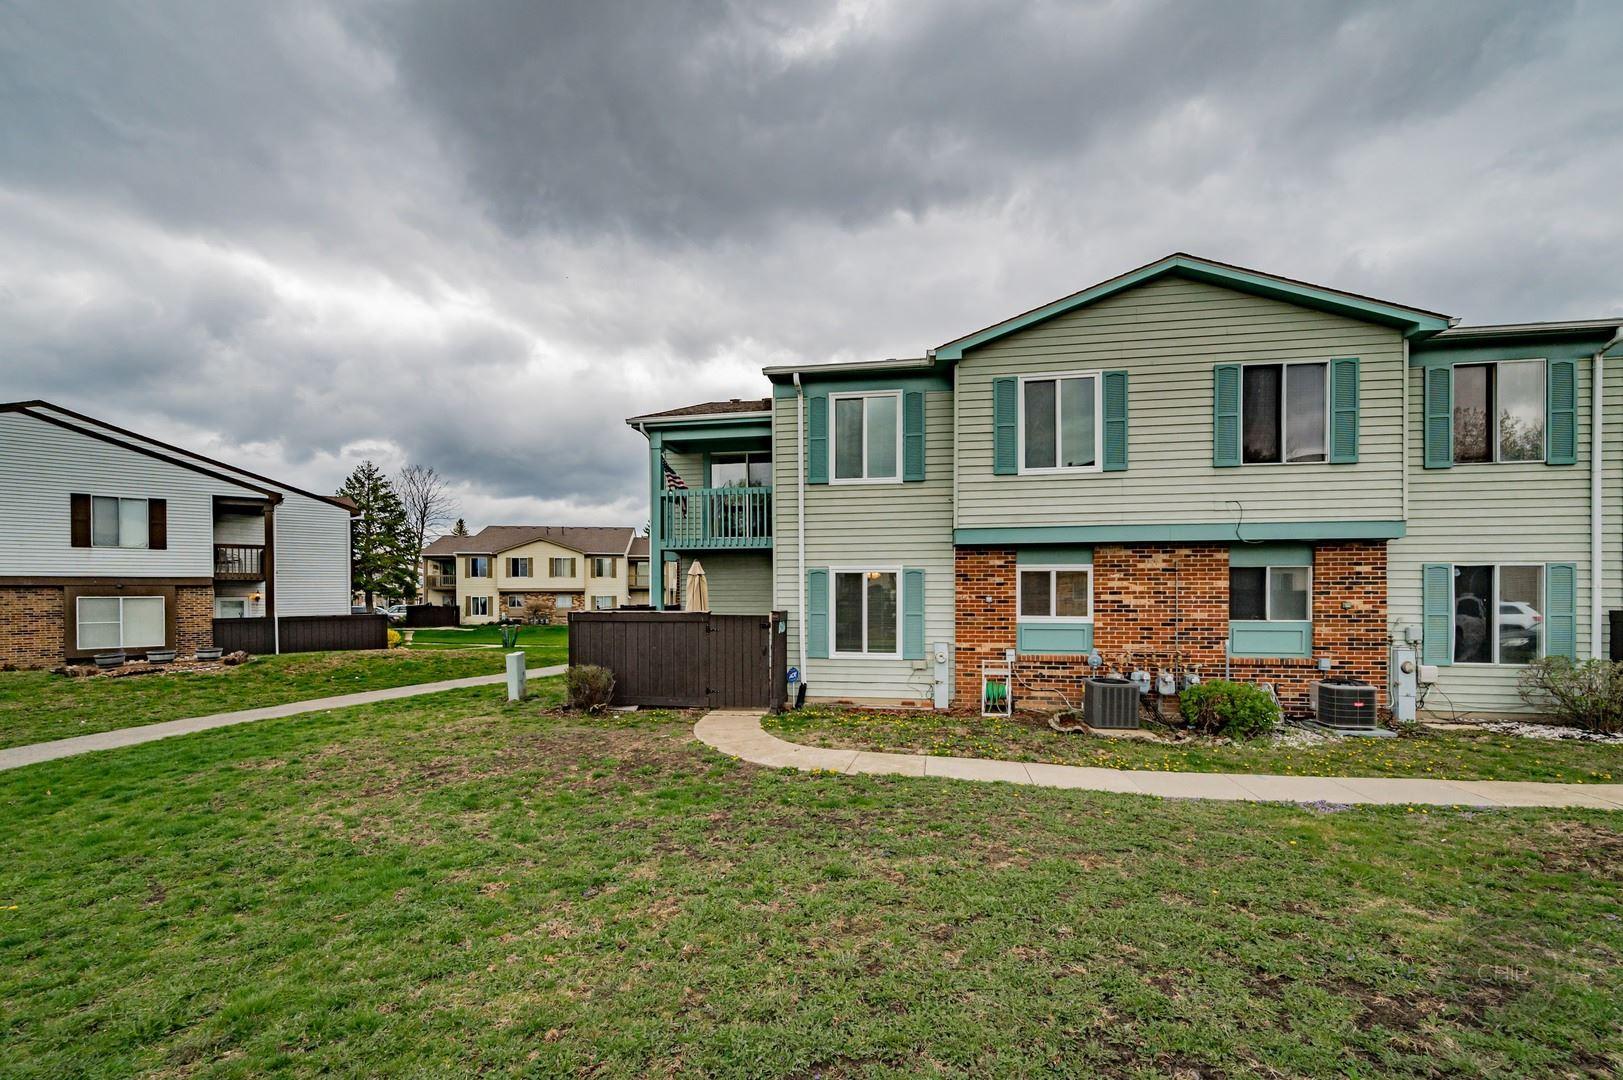 Photo of 18 Fernwood Drive #D, Bolingbrook, IL 60446 (MLS # 11022252)